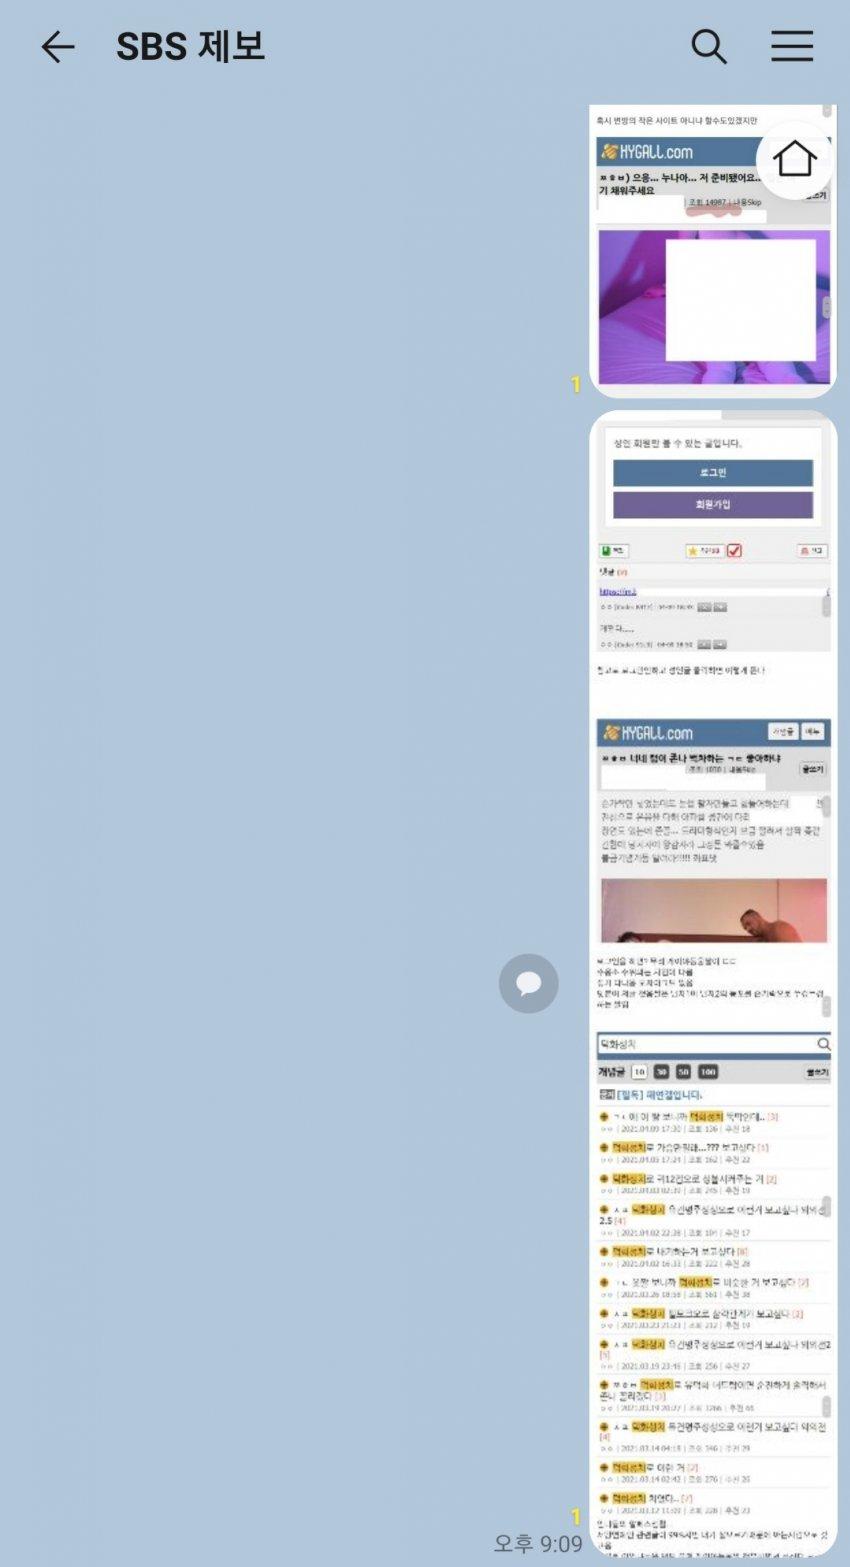 viewimage.php?id=2fbcc323e7d334aa51b1d3a24781&no=24b0d769e1d32ca73fec81fa11d02831b46f6c3837711f4400726c62dd61225b73fad8e182c6022608e96e77283d8e08e9b0aabd8d5f3545050858cfa38098d3fa92108f65e38930cc66b87c433e84251bbcb564442c0e2a41